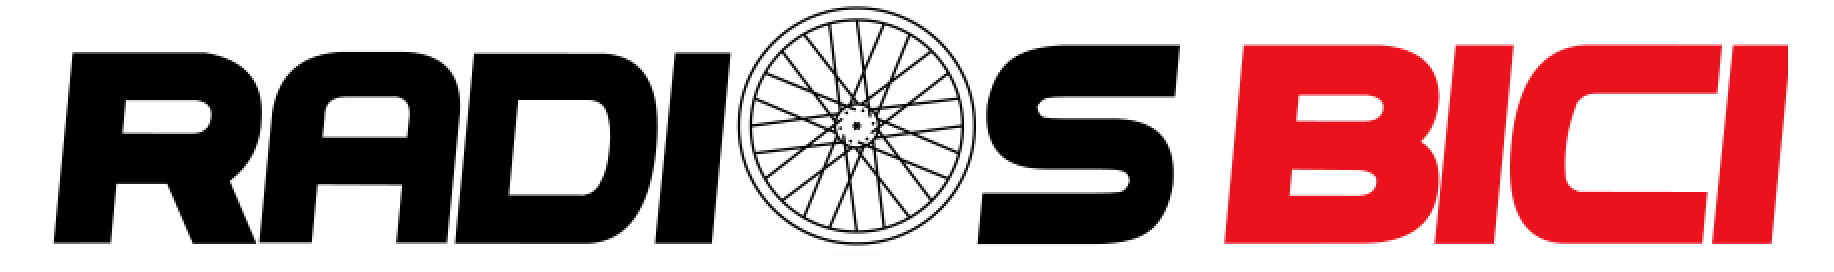 Radios de bici